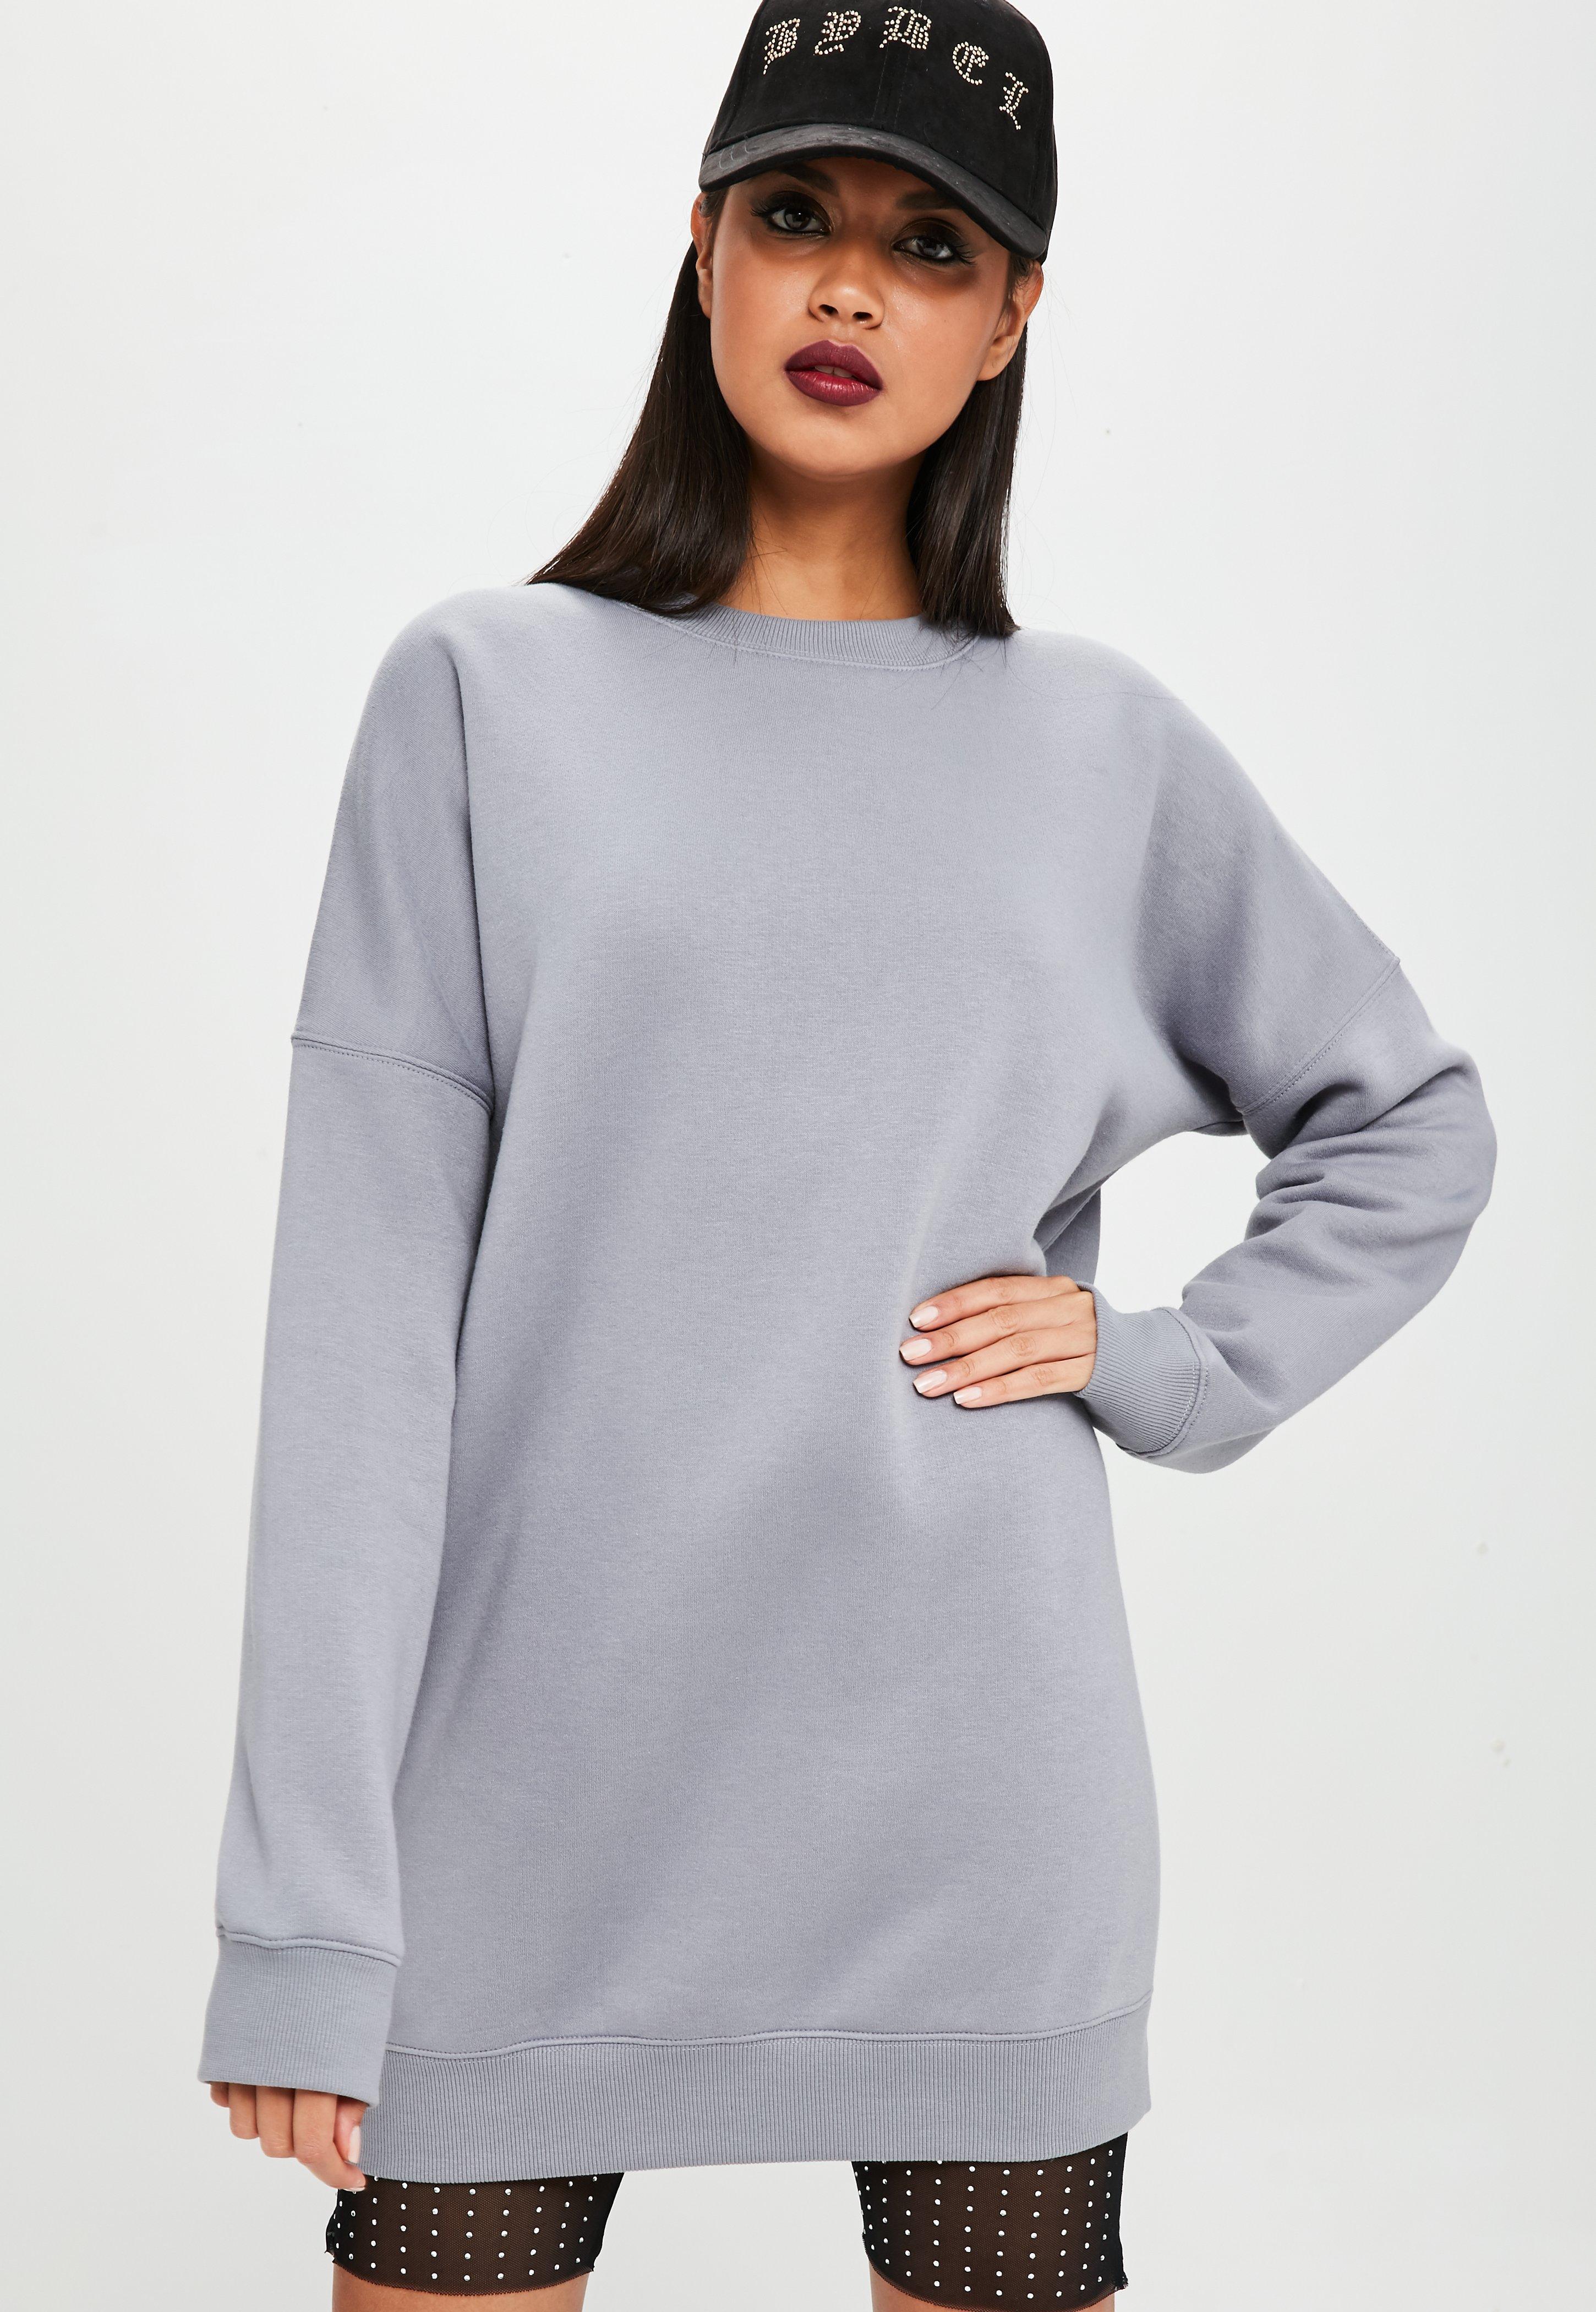 f598f88edb Lyst - Missguided Carli Bybel X Grey Oversized Jumper Dress in Gray